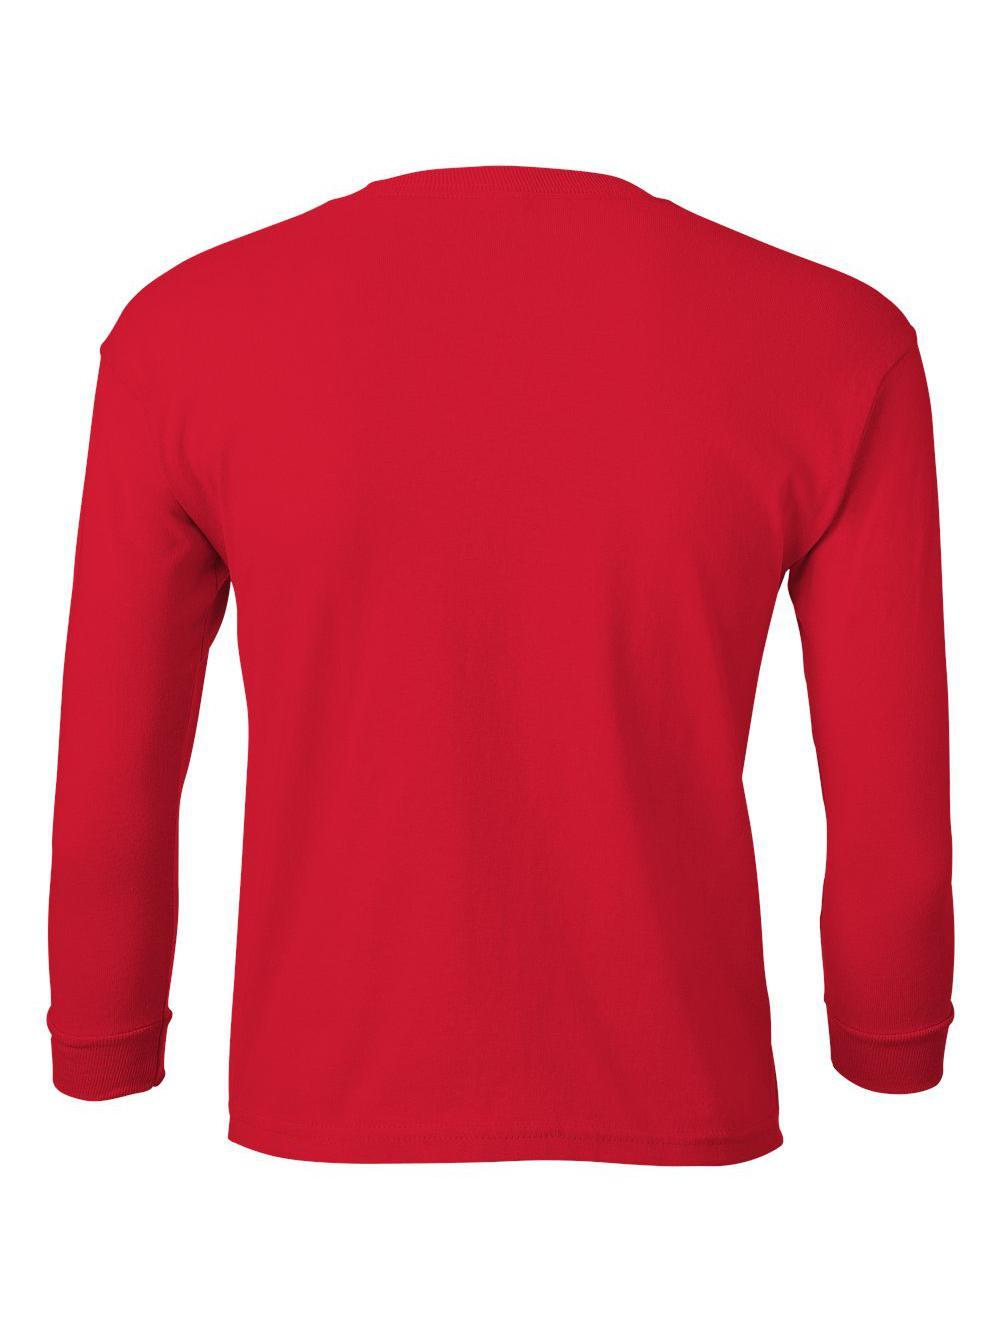 Gildan-Ultra-Cotton-Youth-Long-Sleeve-T-Shirt-2400B thumbnail 34